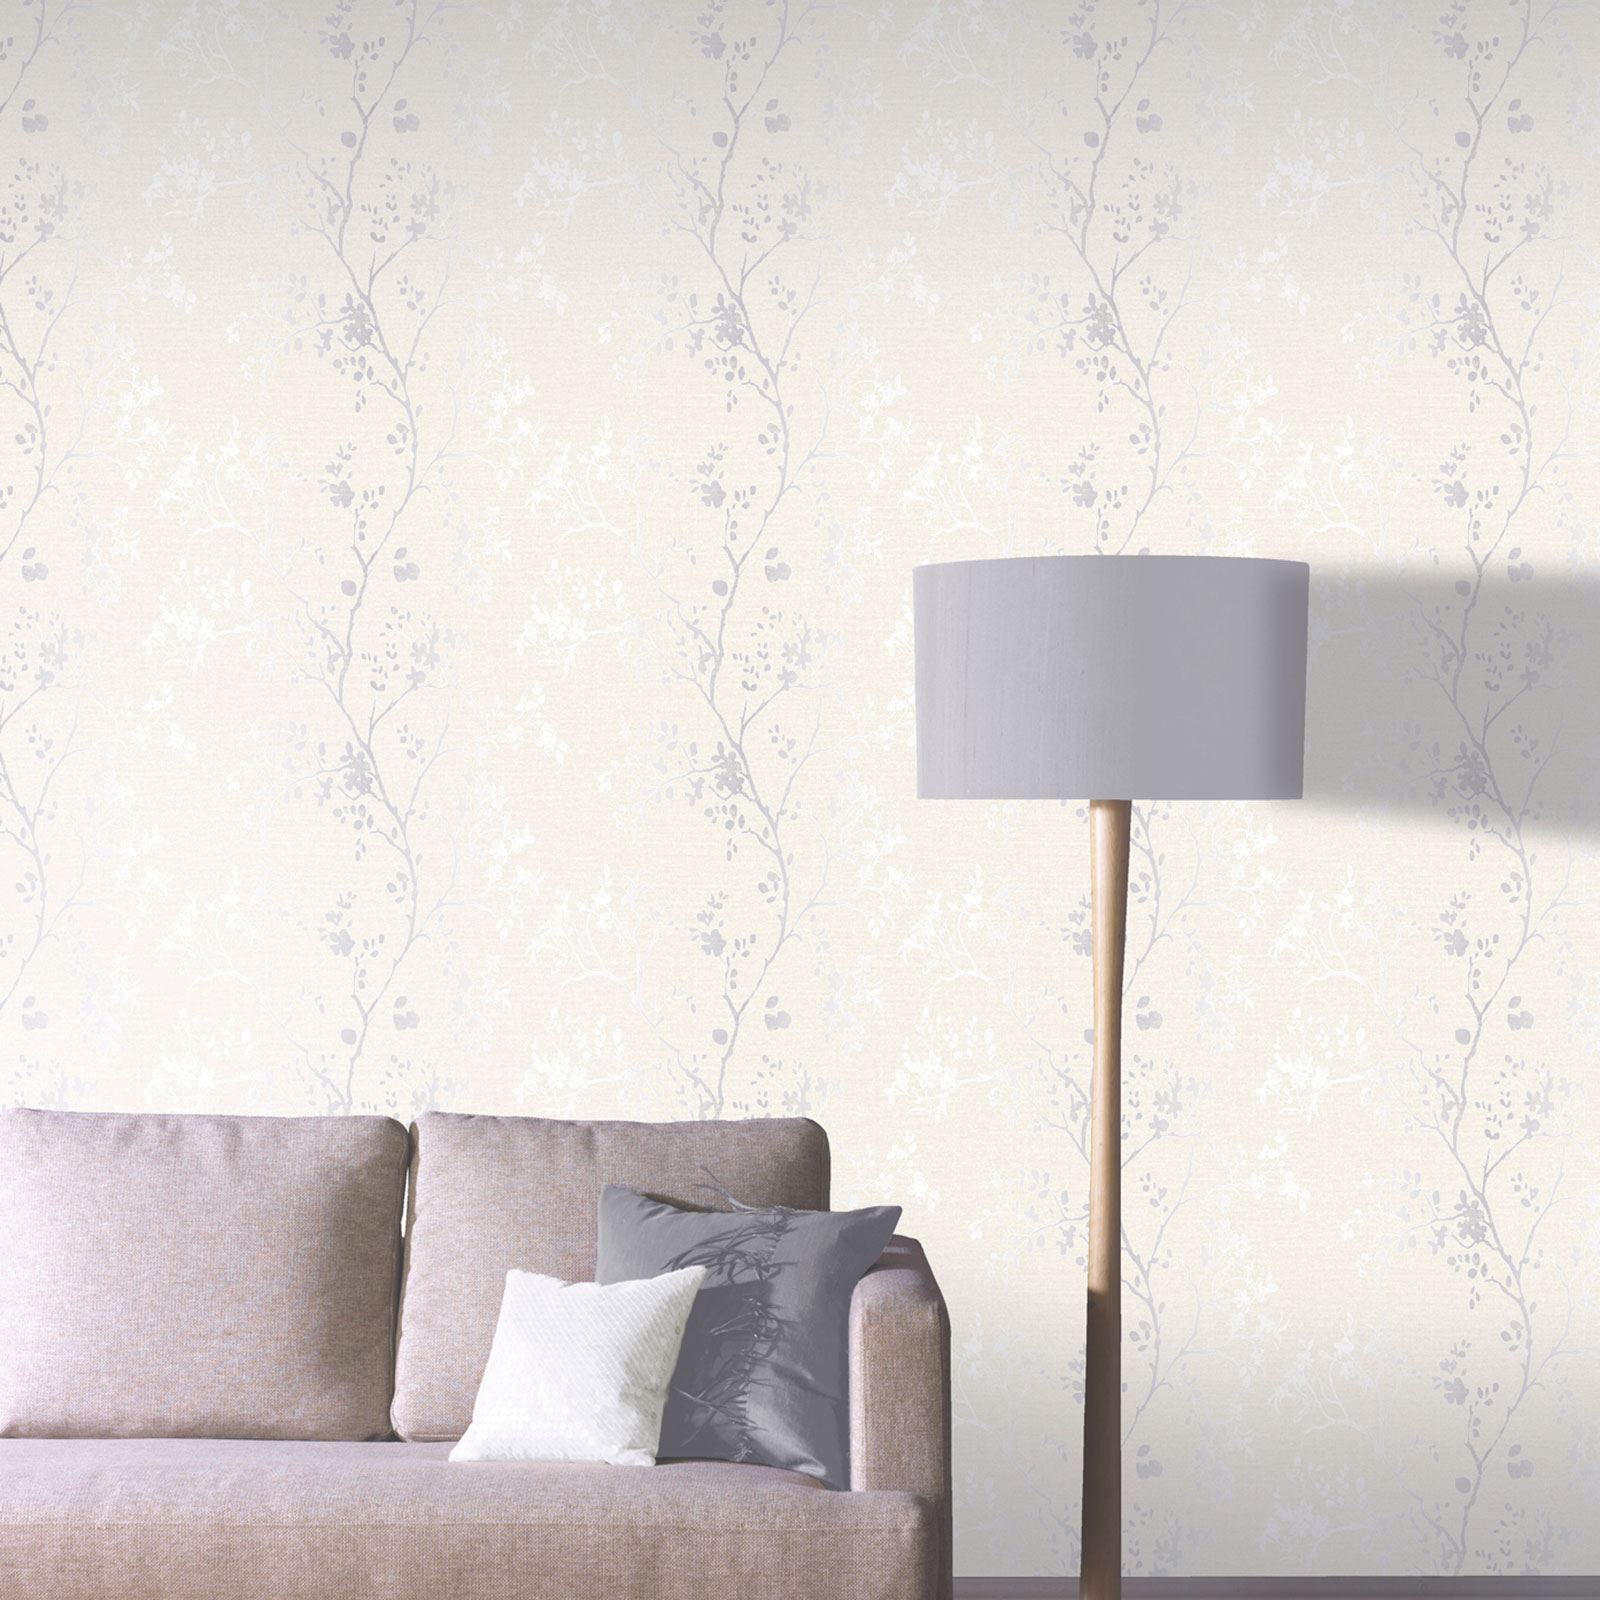 Arthouse precious metalle orabella blumen tapete perlmutt silber creme 673402 for Peinture beige rose